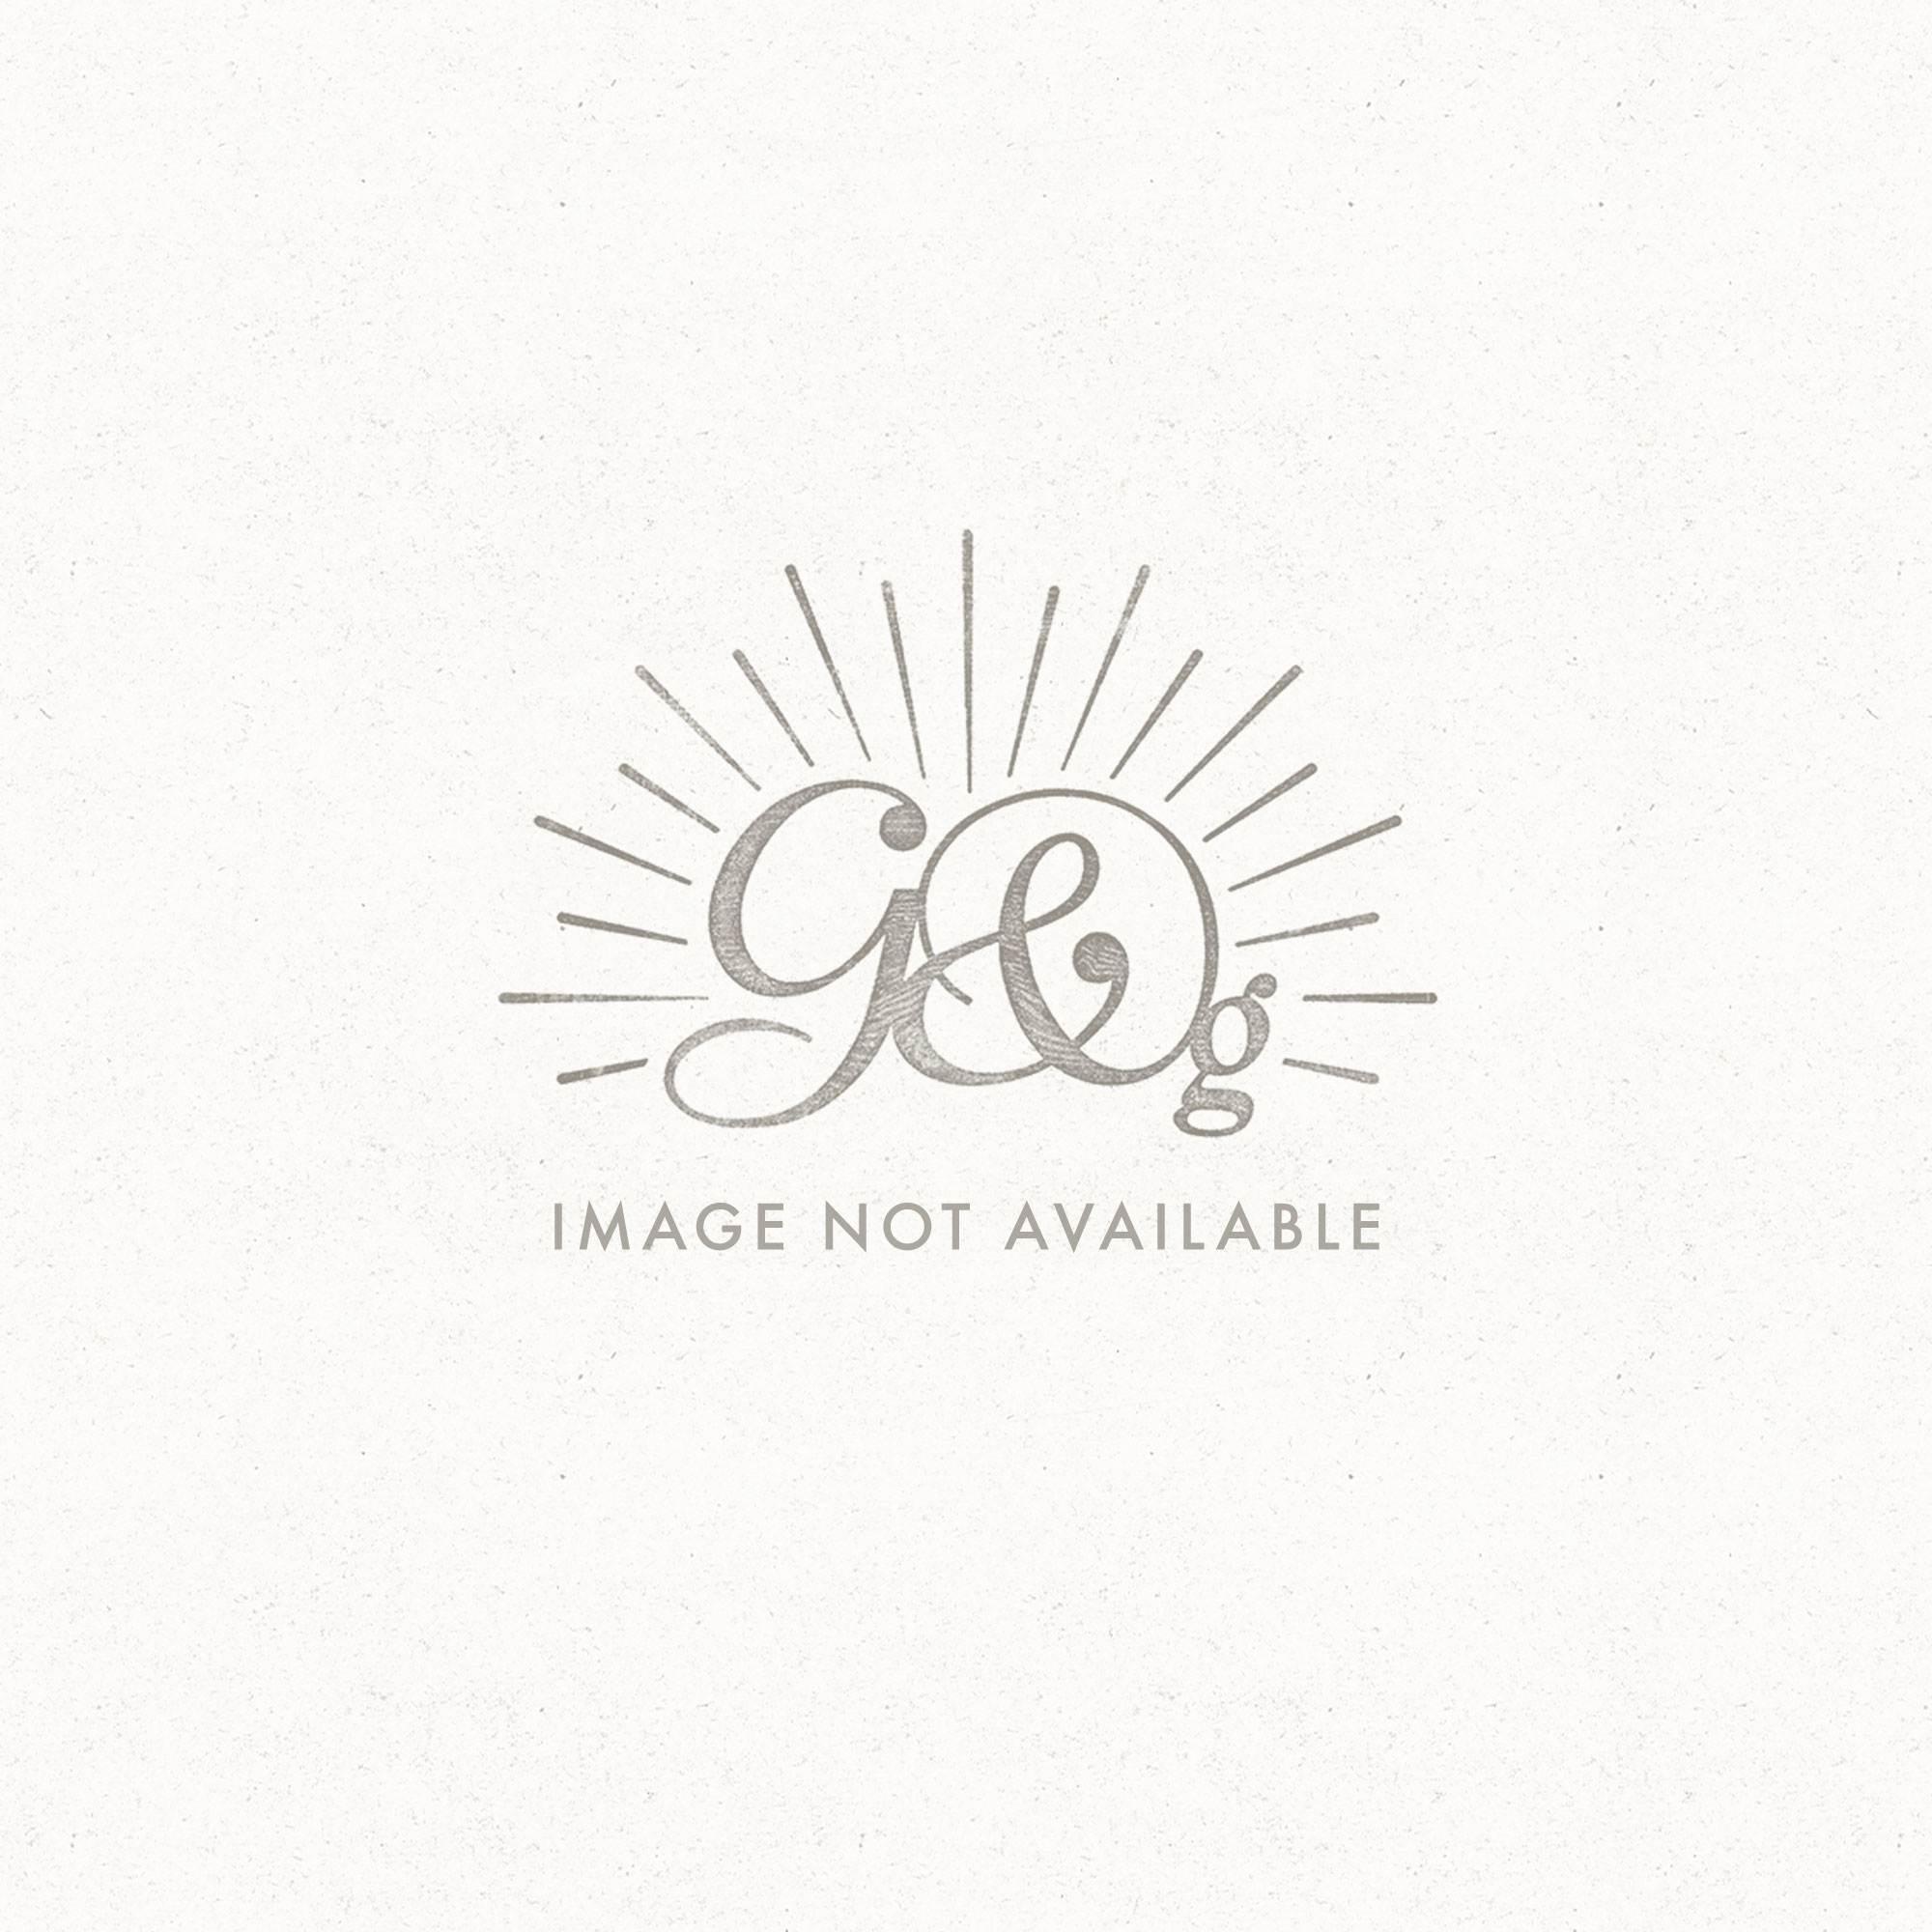 Single Sheepskins - Thumbnail